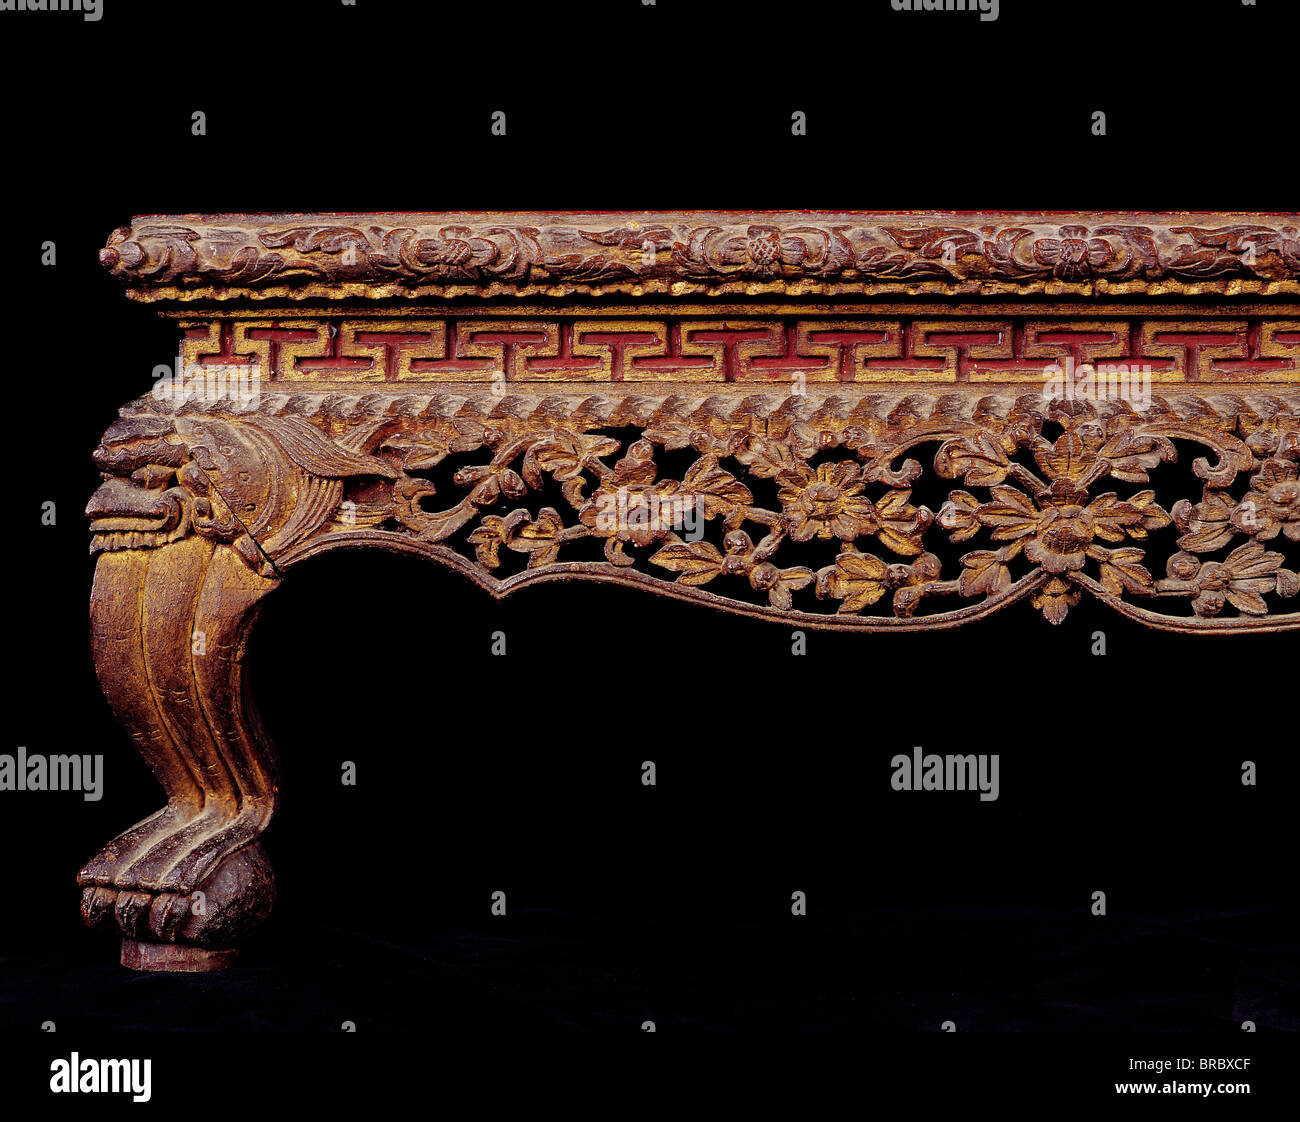 Detalle de un siglo xix tabla tailandés, Tailandia Imagen De Stock